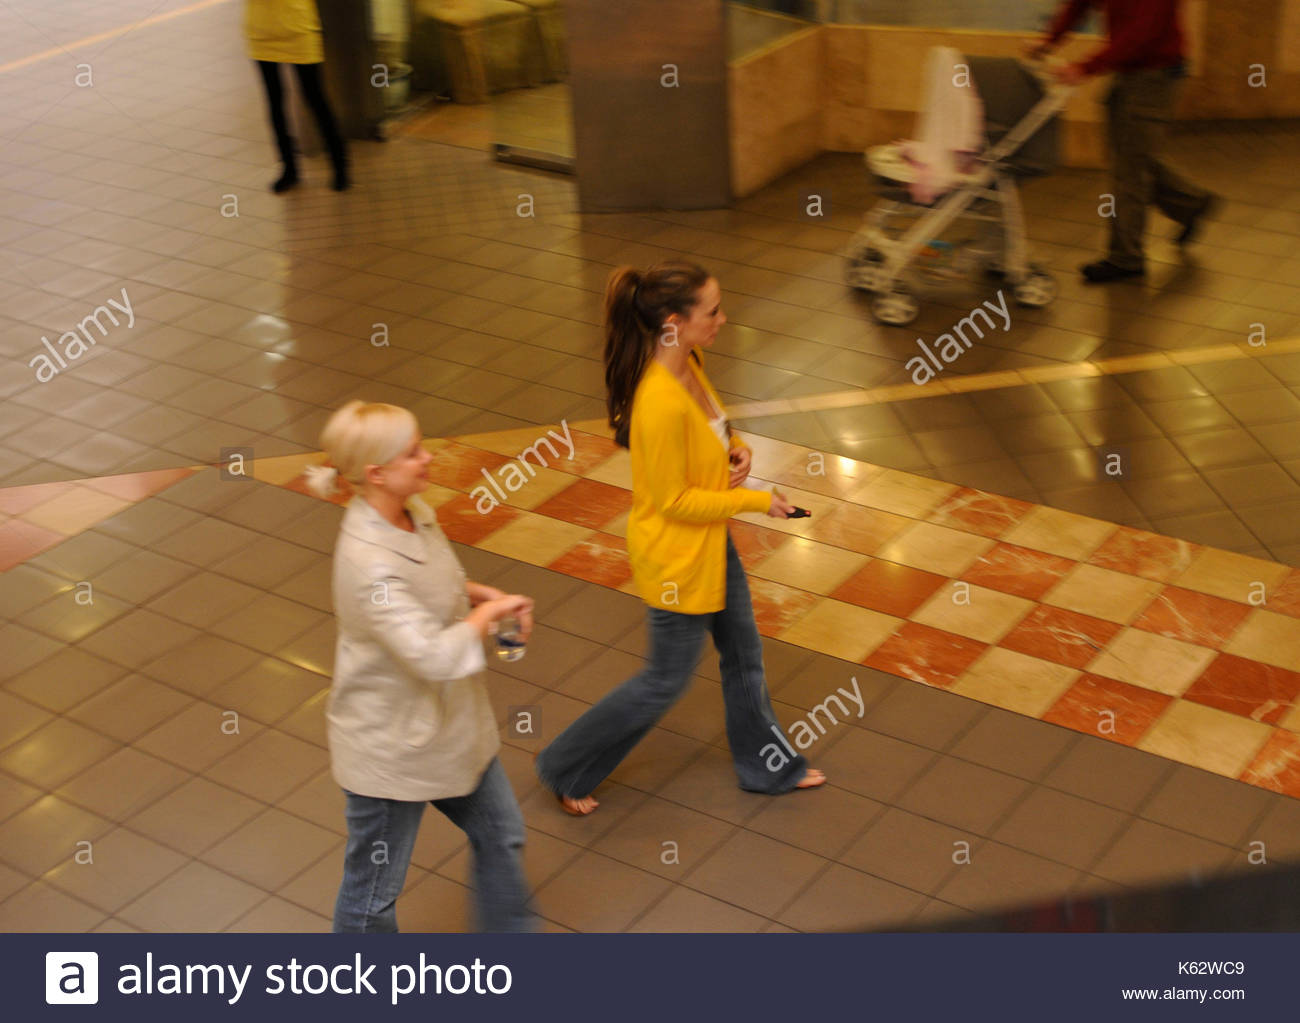 Jennifer Love Hewitt broke up with her fiance for money 03.02.2009 8